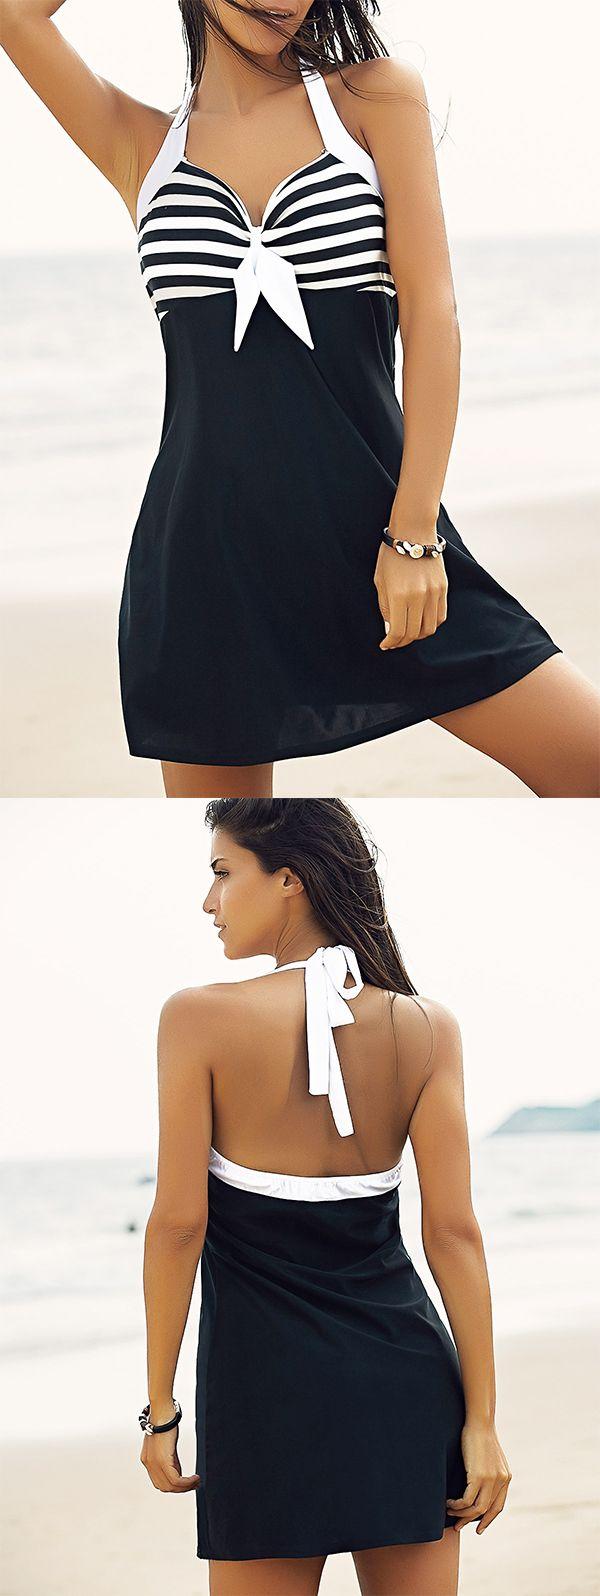 Halter One-Piece Striped Multi Convertible Way Women's Swimwear